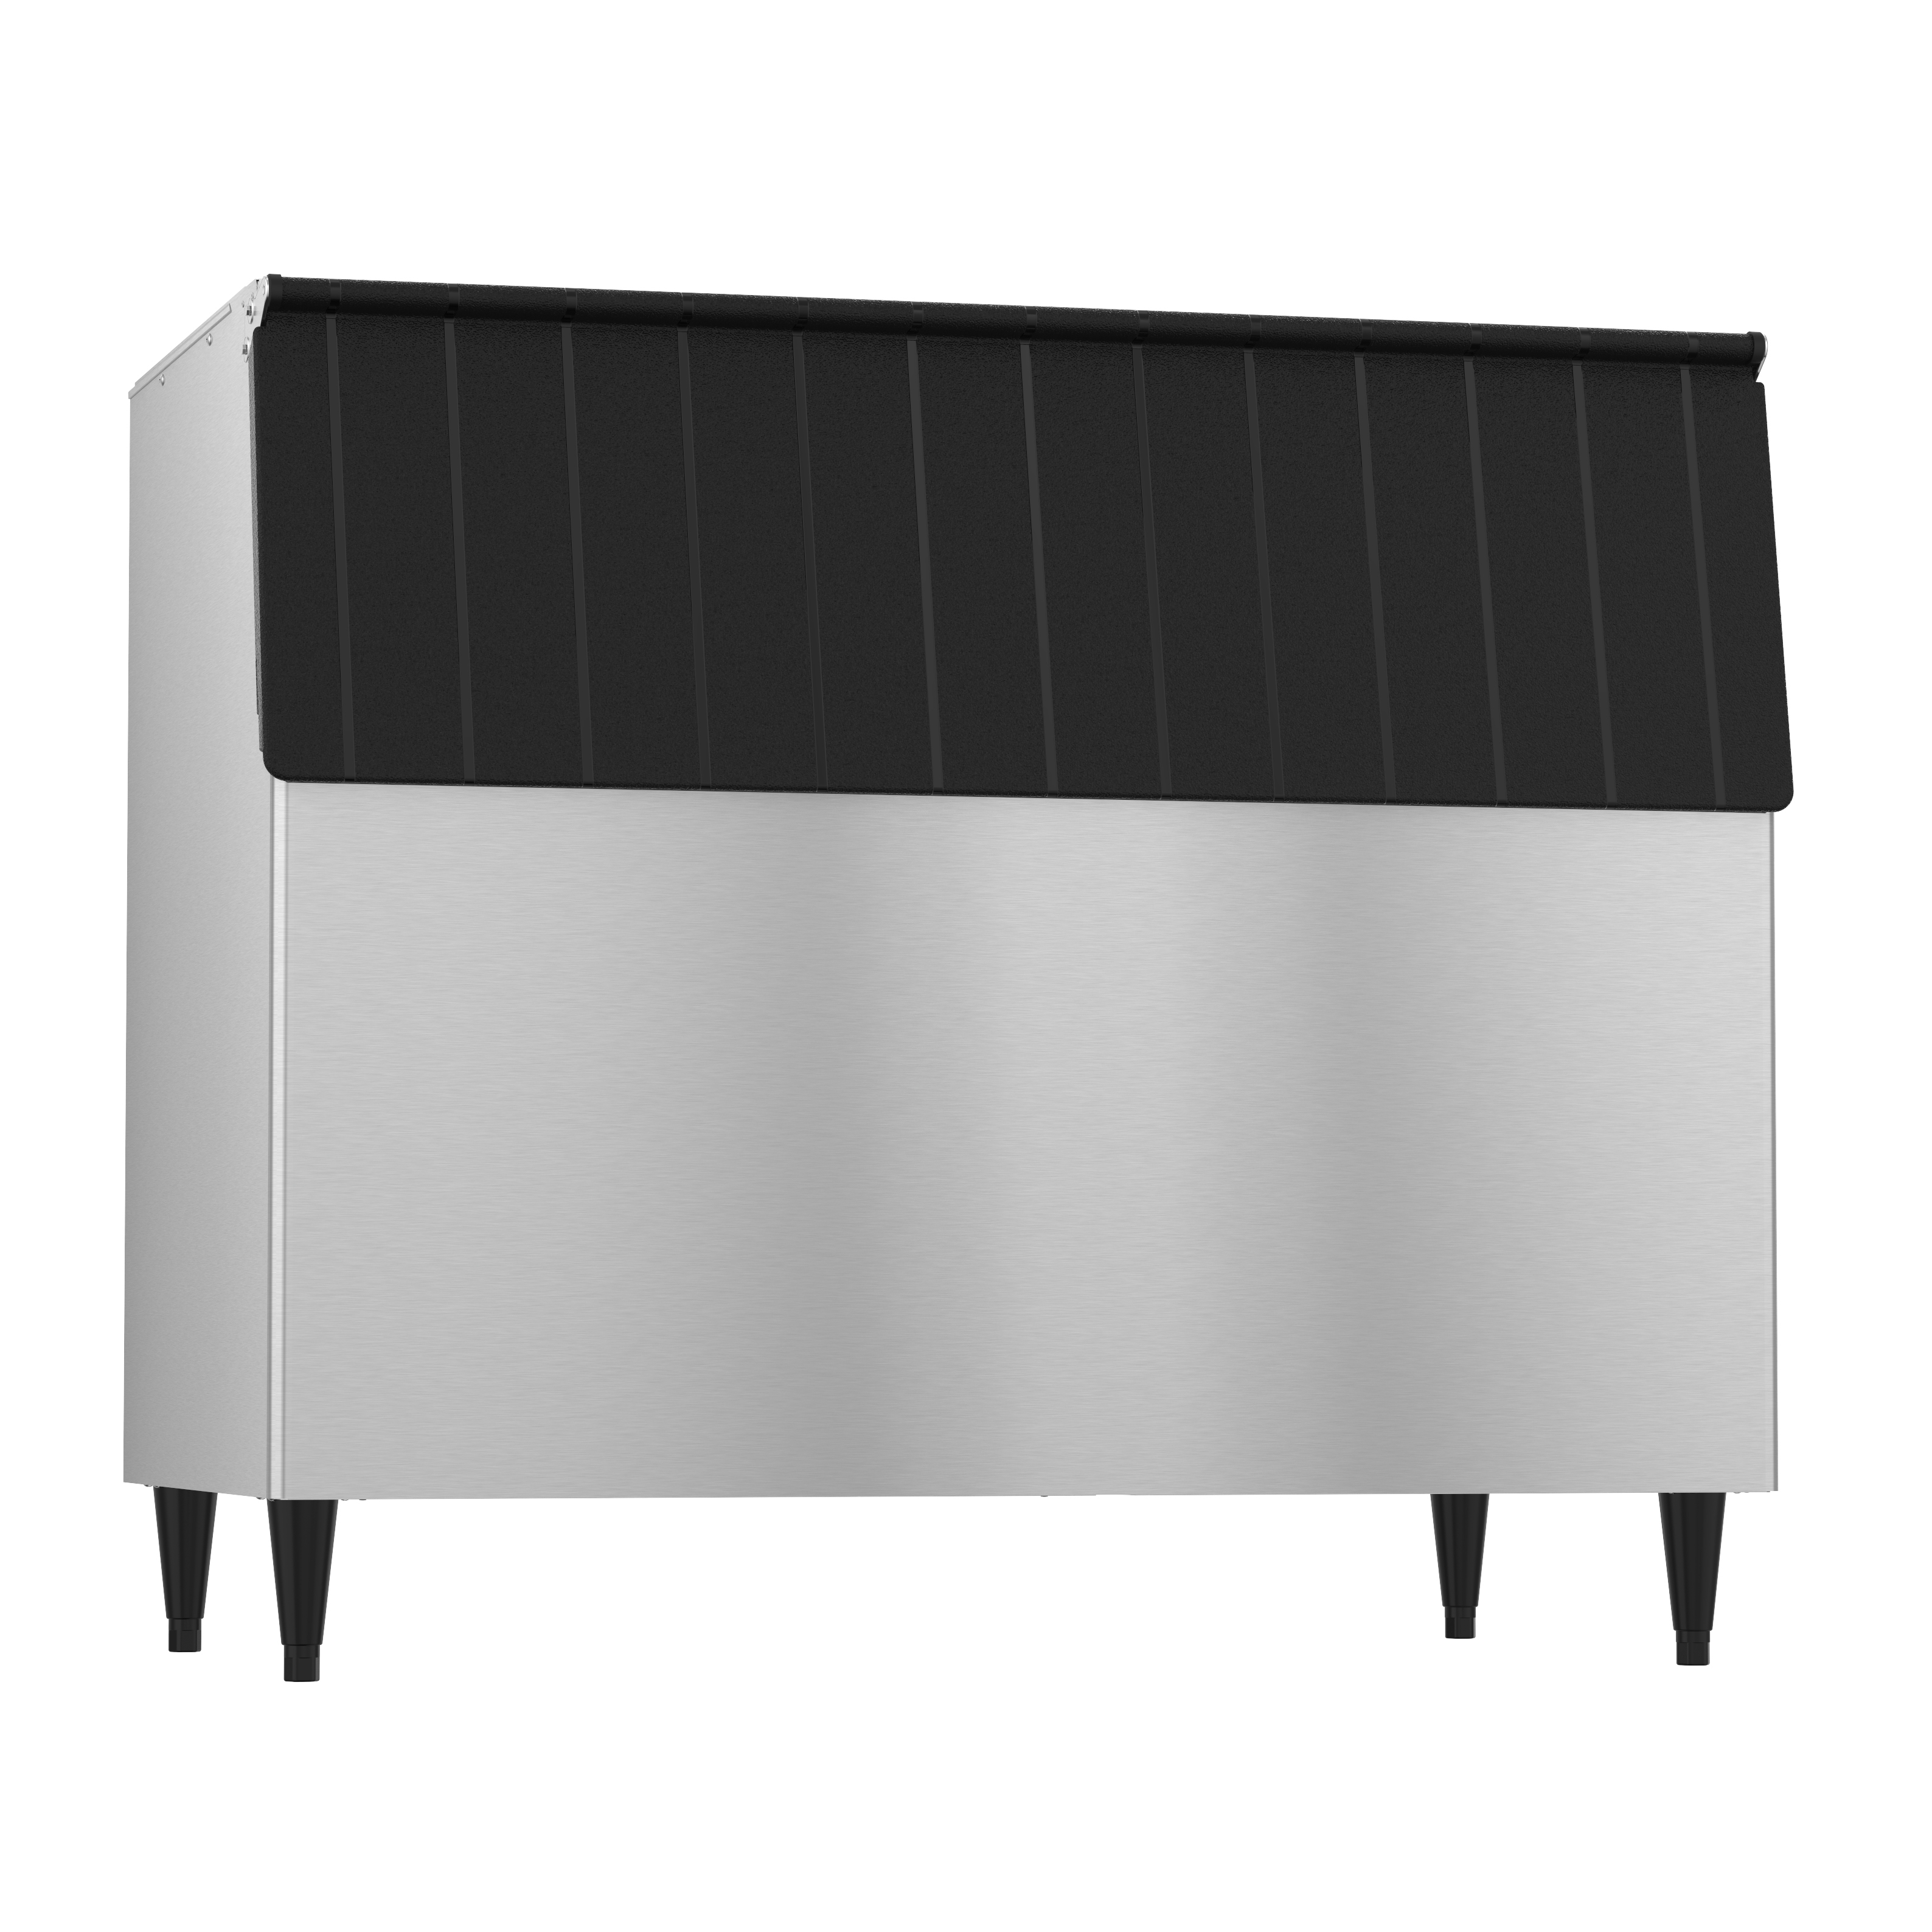 Hoshizaki B-900SF ice cubers, ice storage & ice dispensers